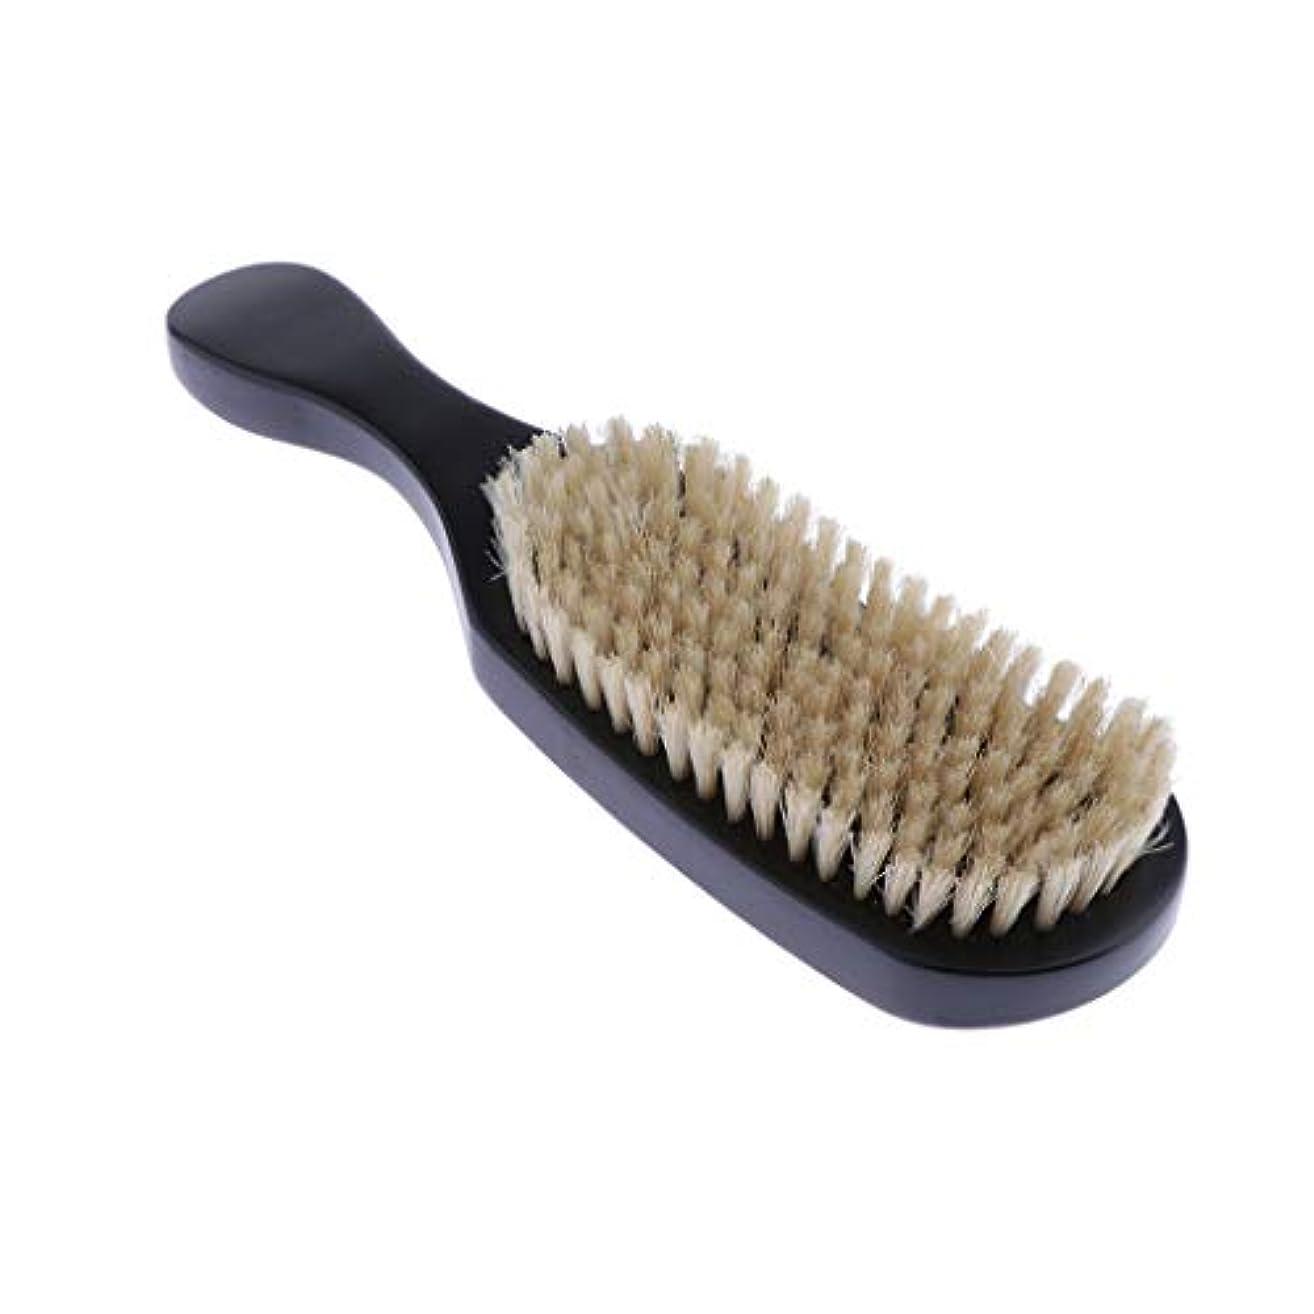 DYNWAVE へアカラーセット ヘアダイブラシ DIY髪染め用 サロン 美髪師用 ヘアカラーの用具 全4色 - ブラック